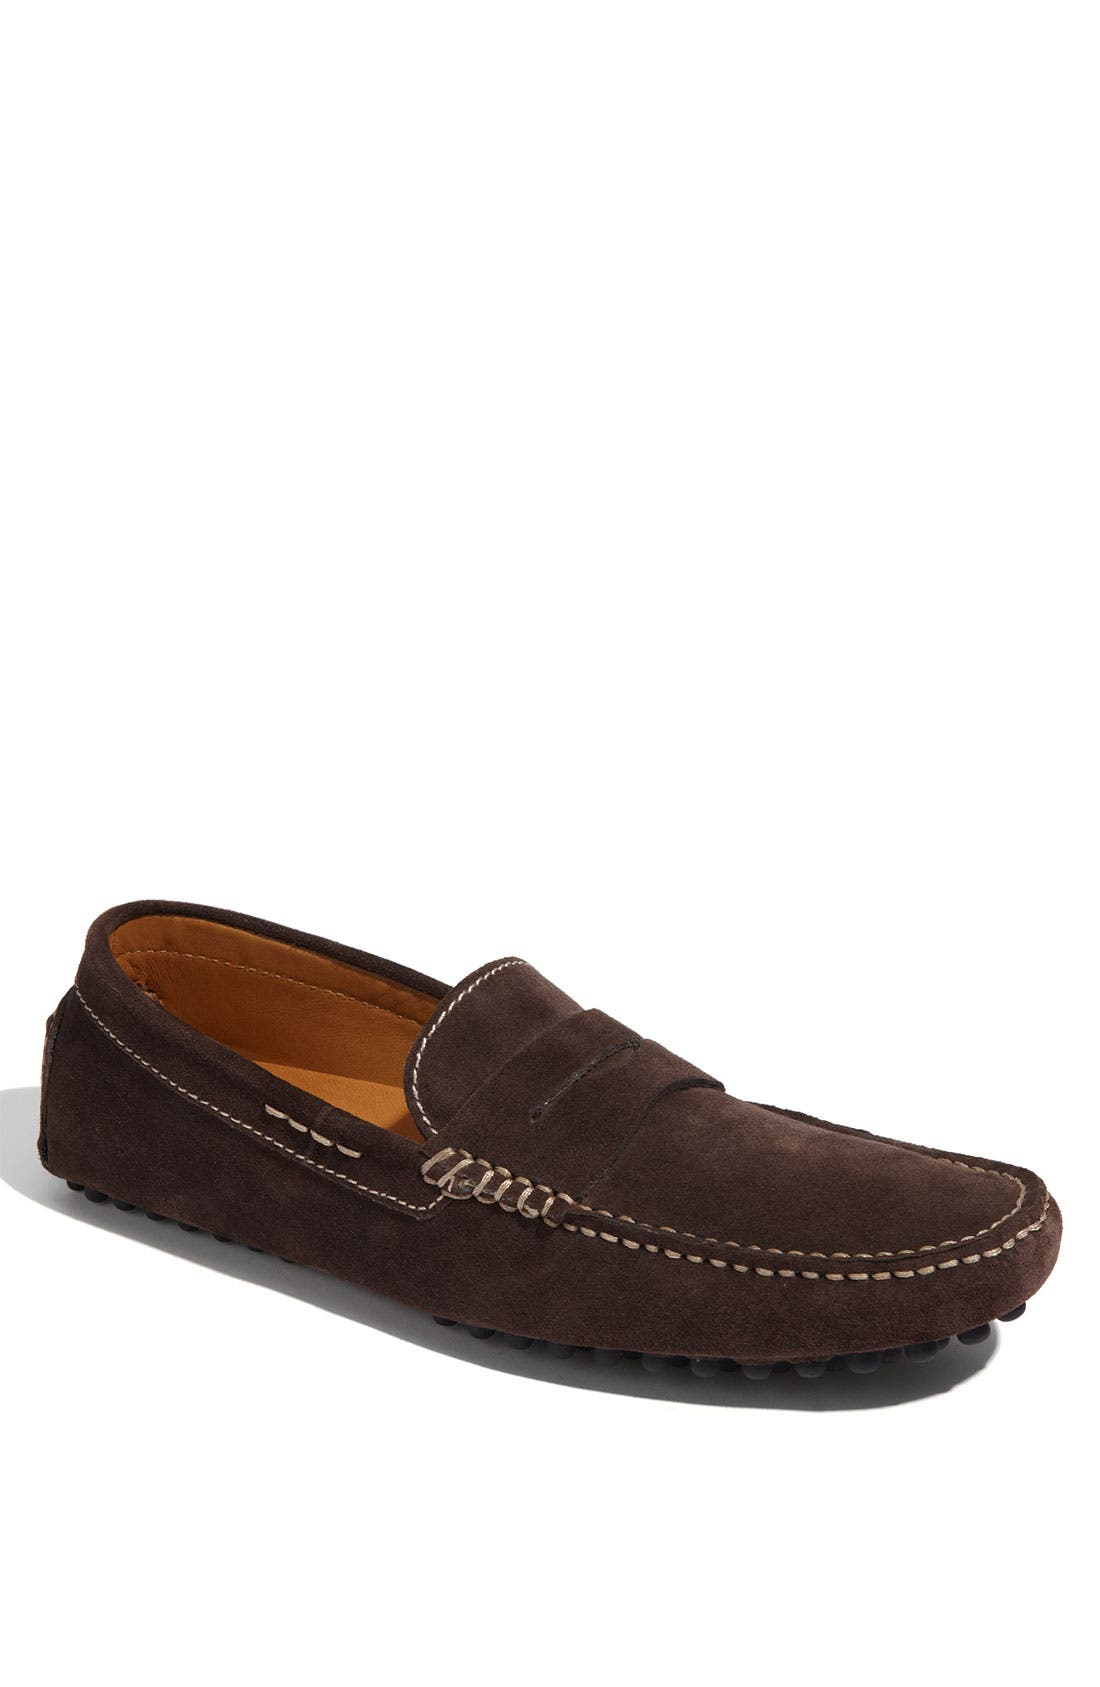 'Tobago' Driving Shoe,                         Main,                         color, 200